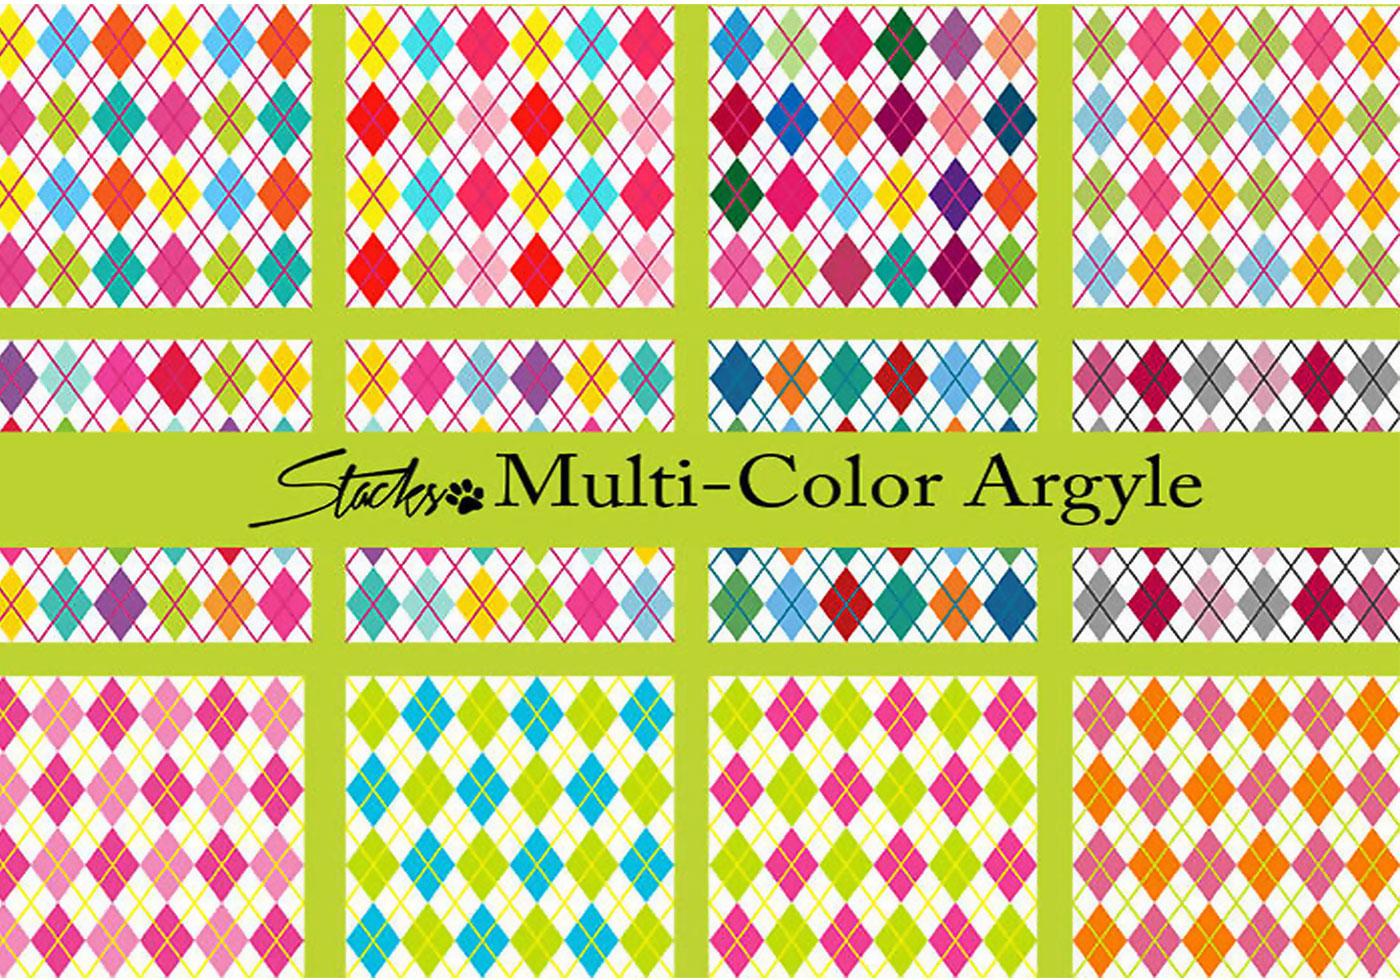 Bright Argyle Patterns Free Photoshop Patterns At Brusheezy